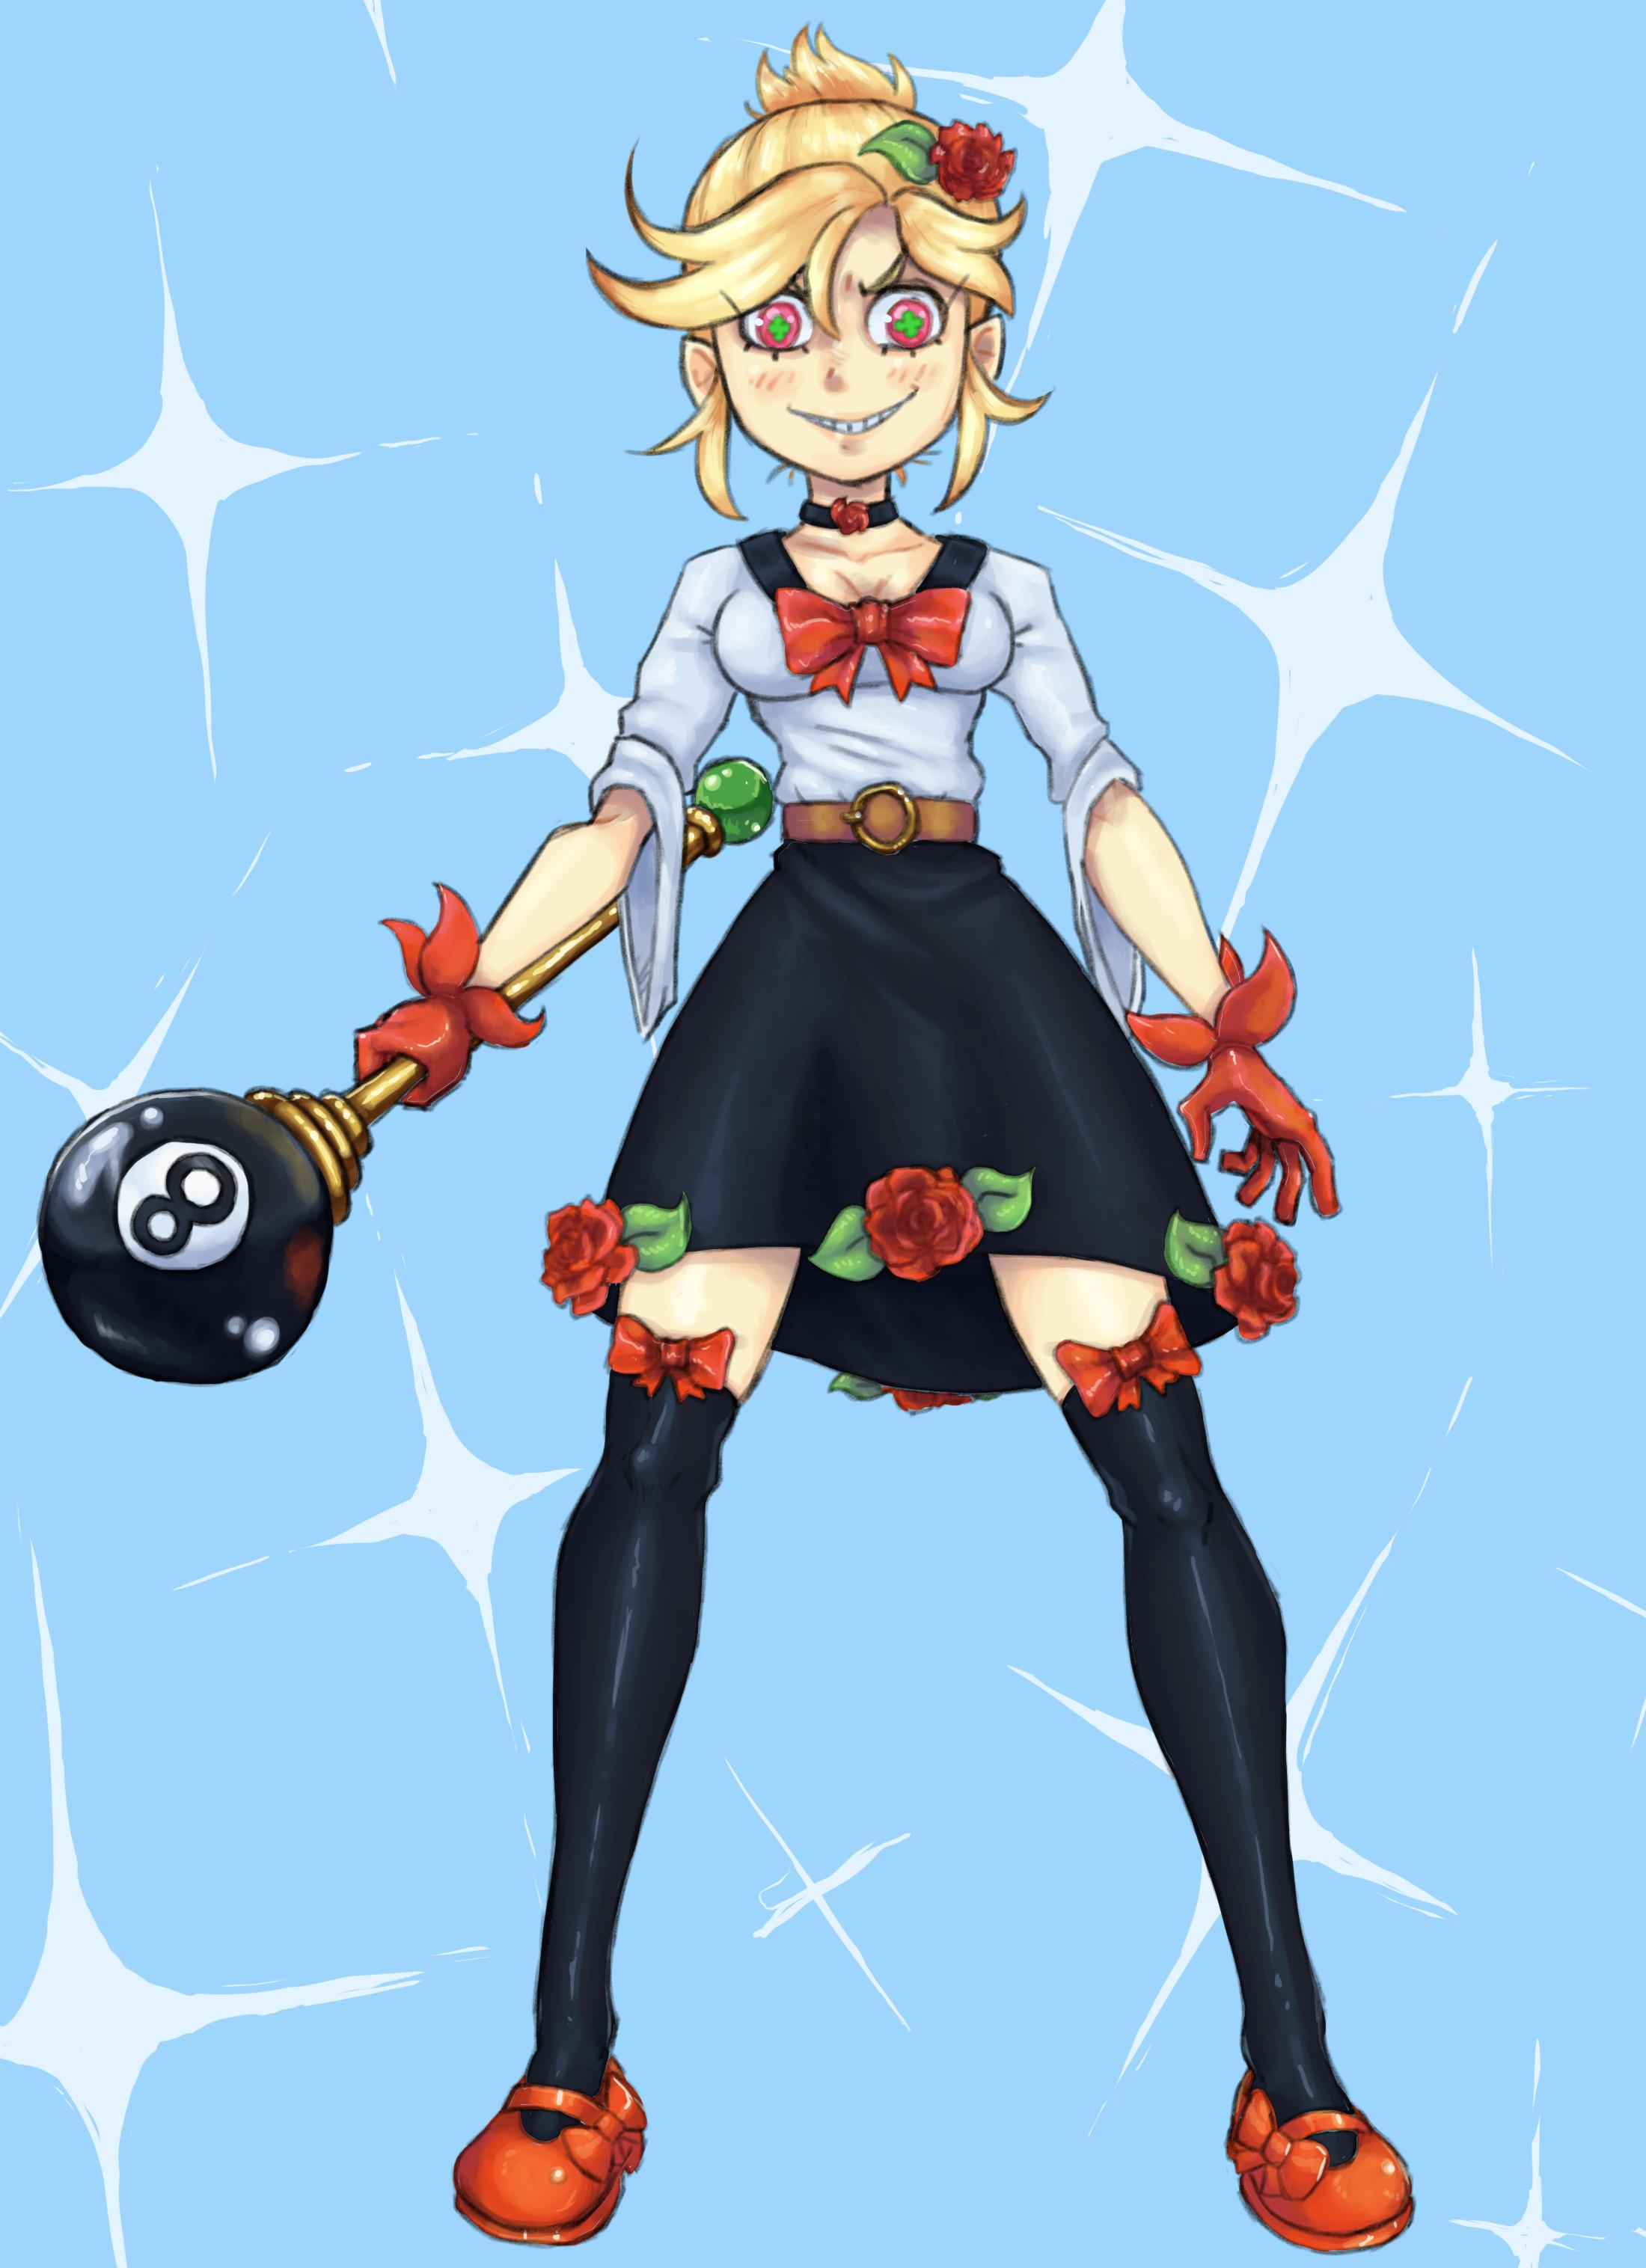 magical girl or something